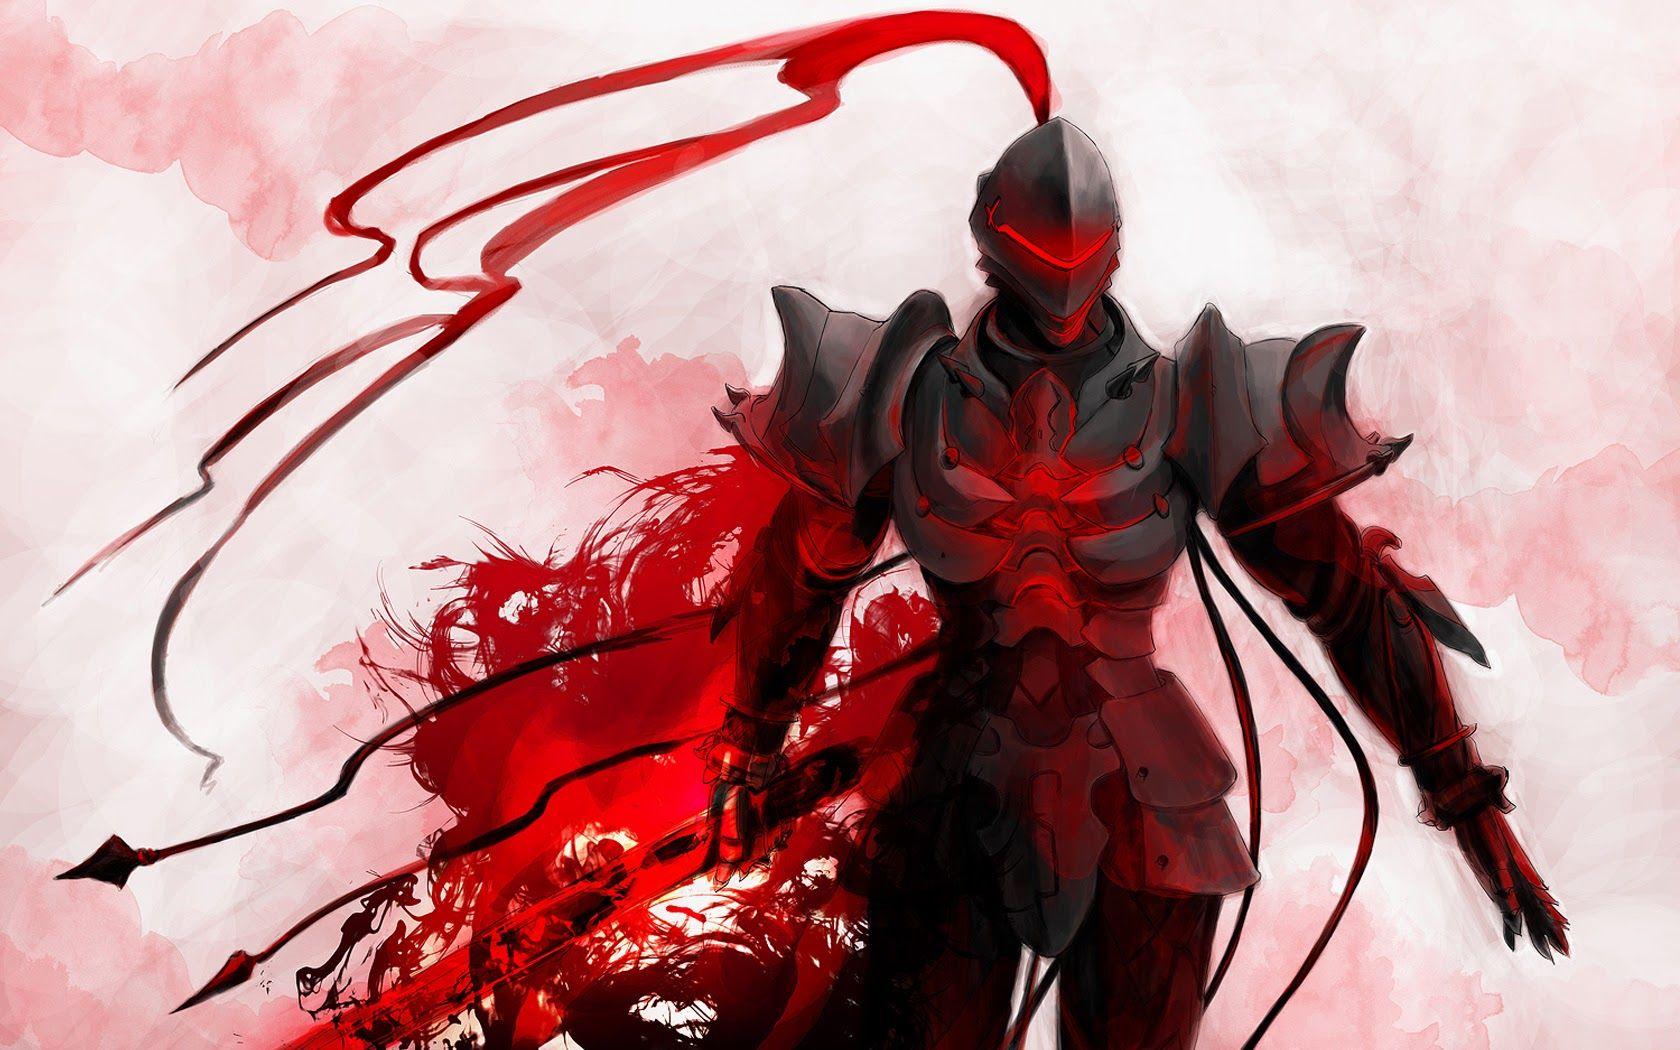 Berserker Fate Zero Wallpaper Anime Black Armor Knight 1680 1050 Berserker Fate Fate Zero Fate